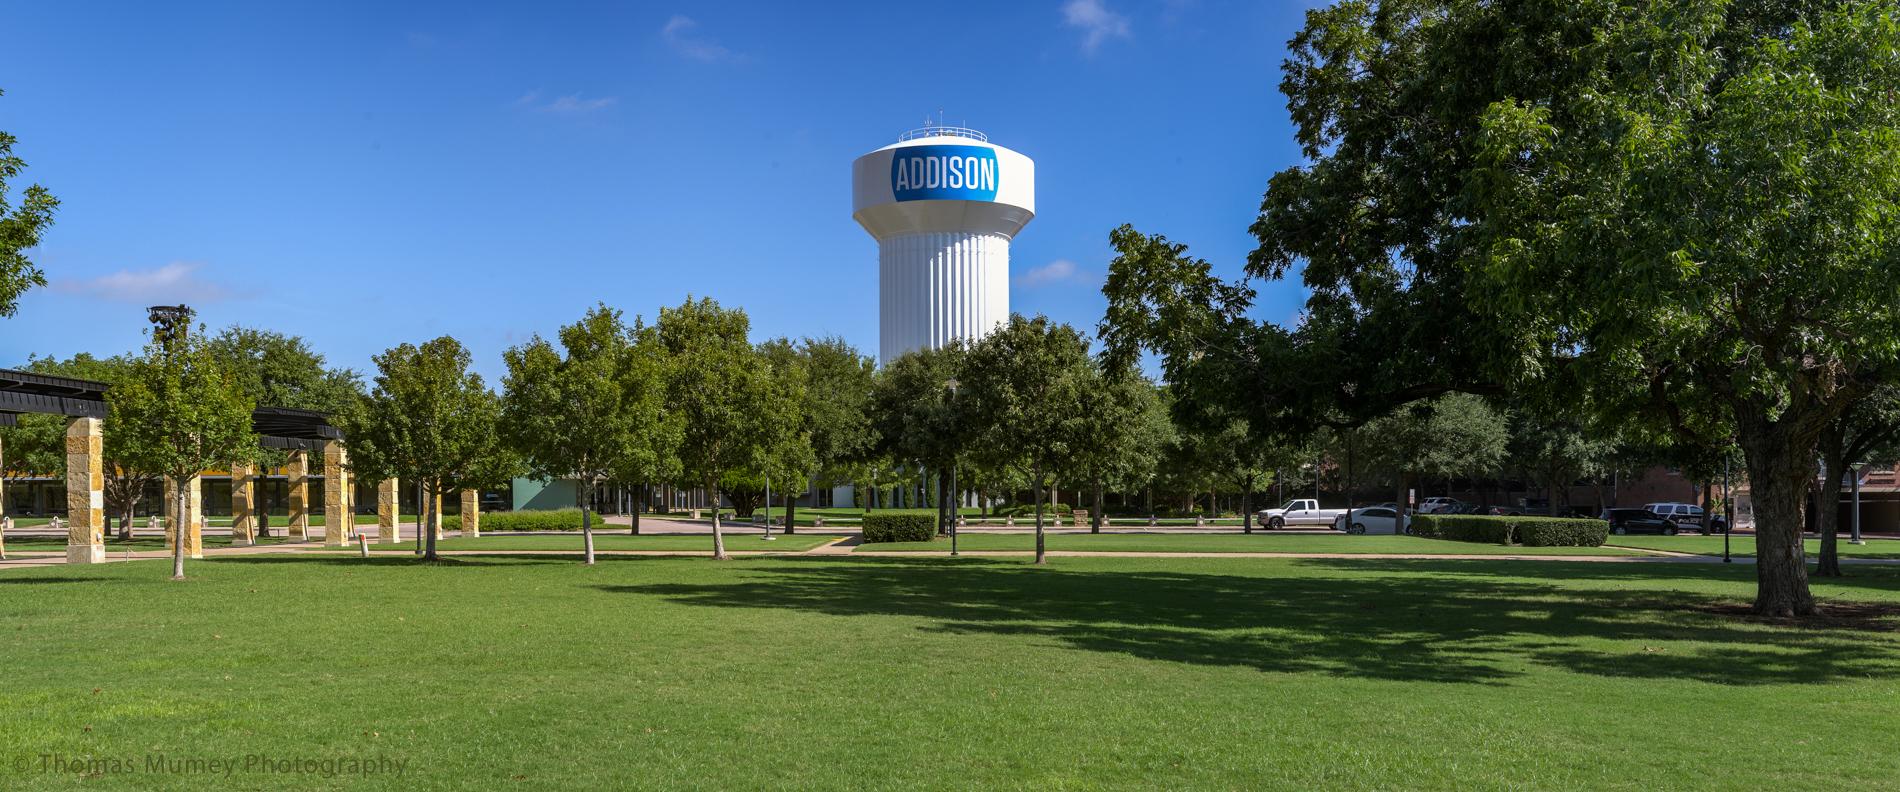 Addison Circle Park